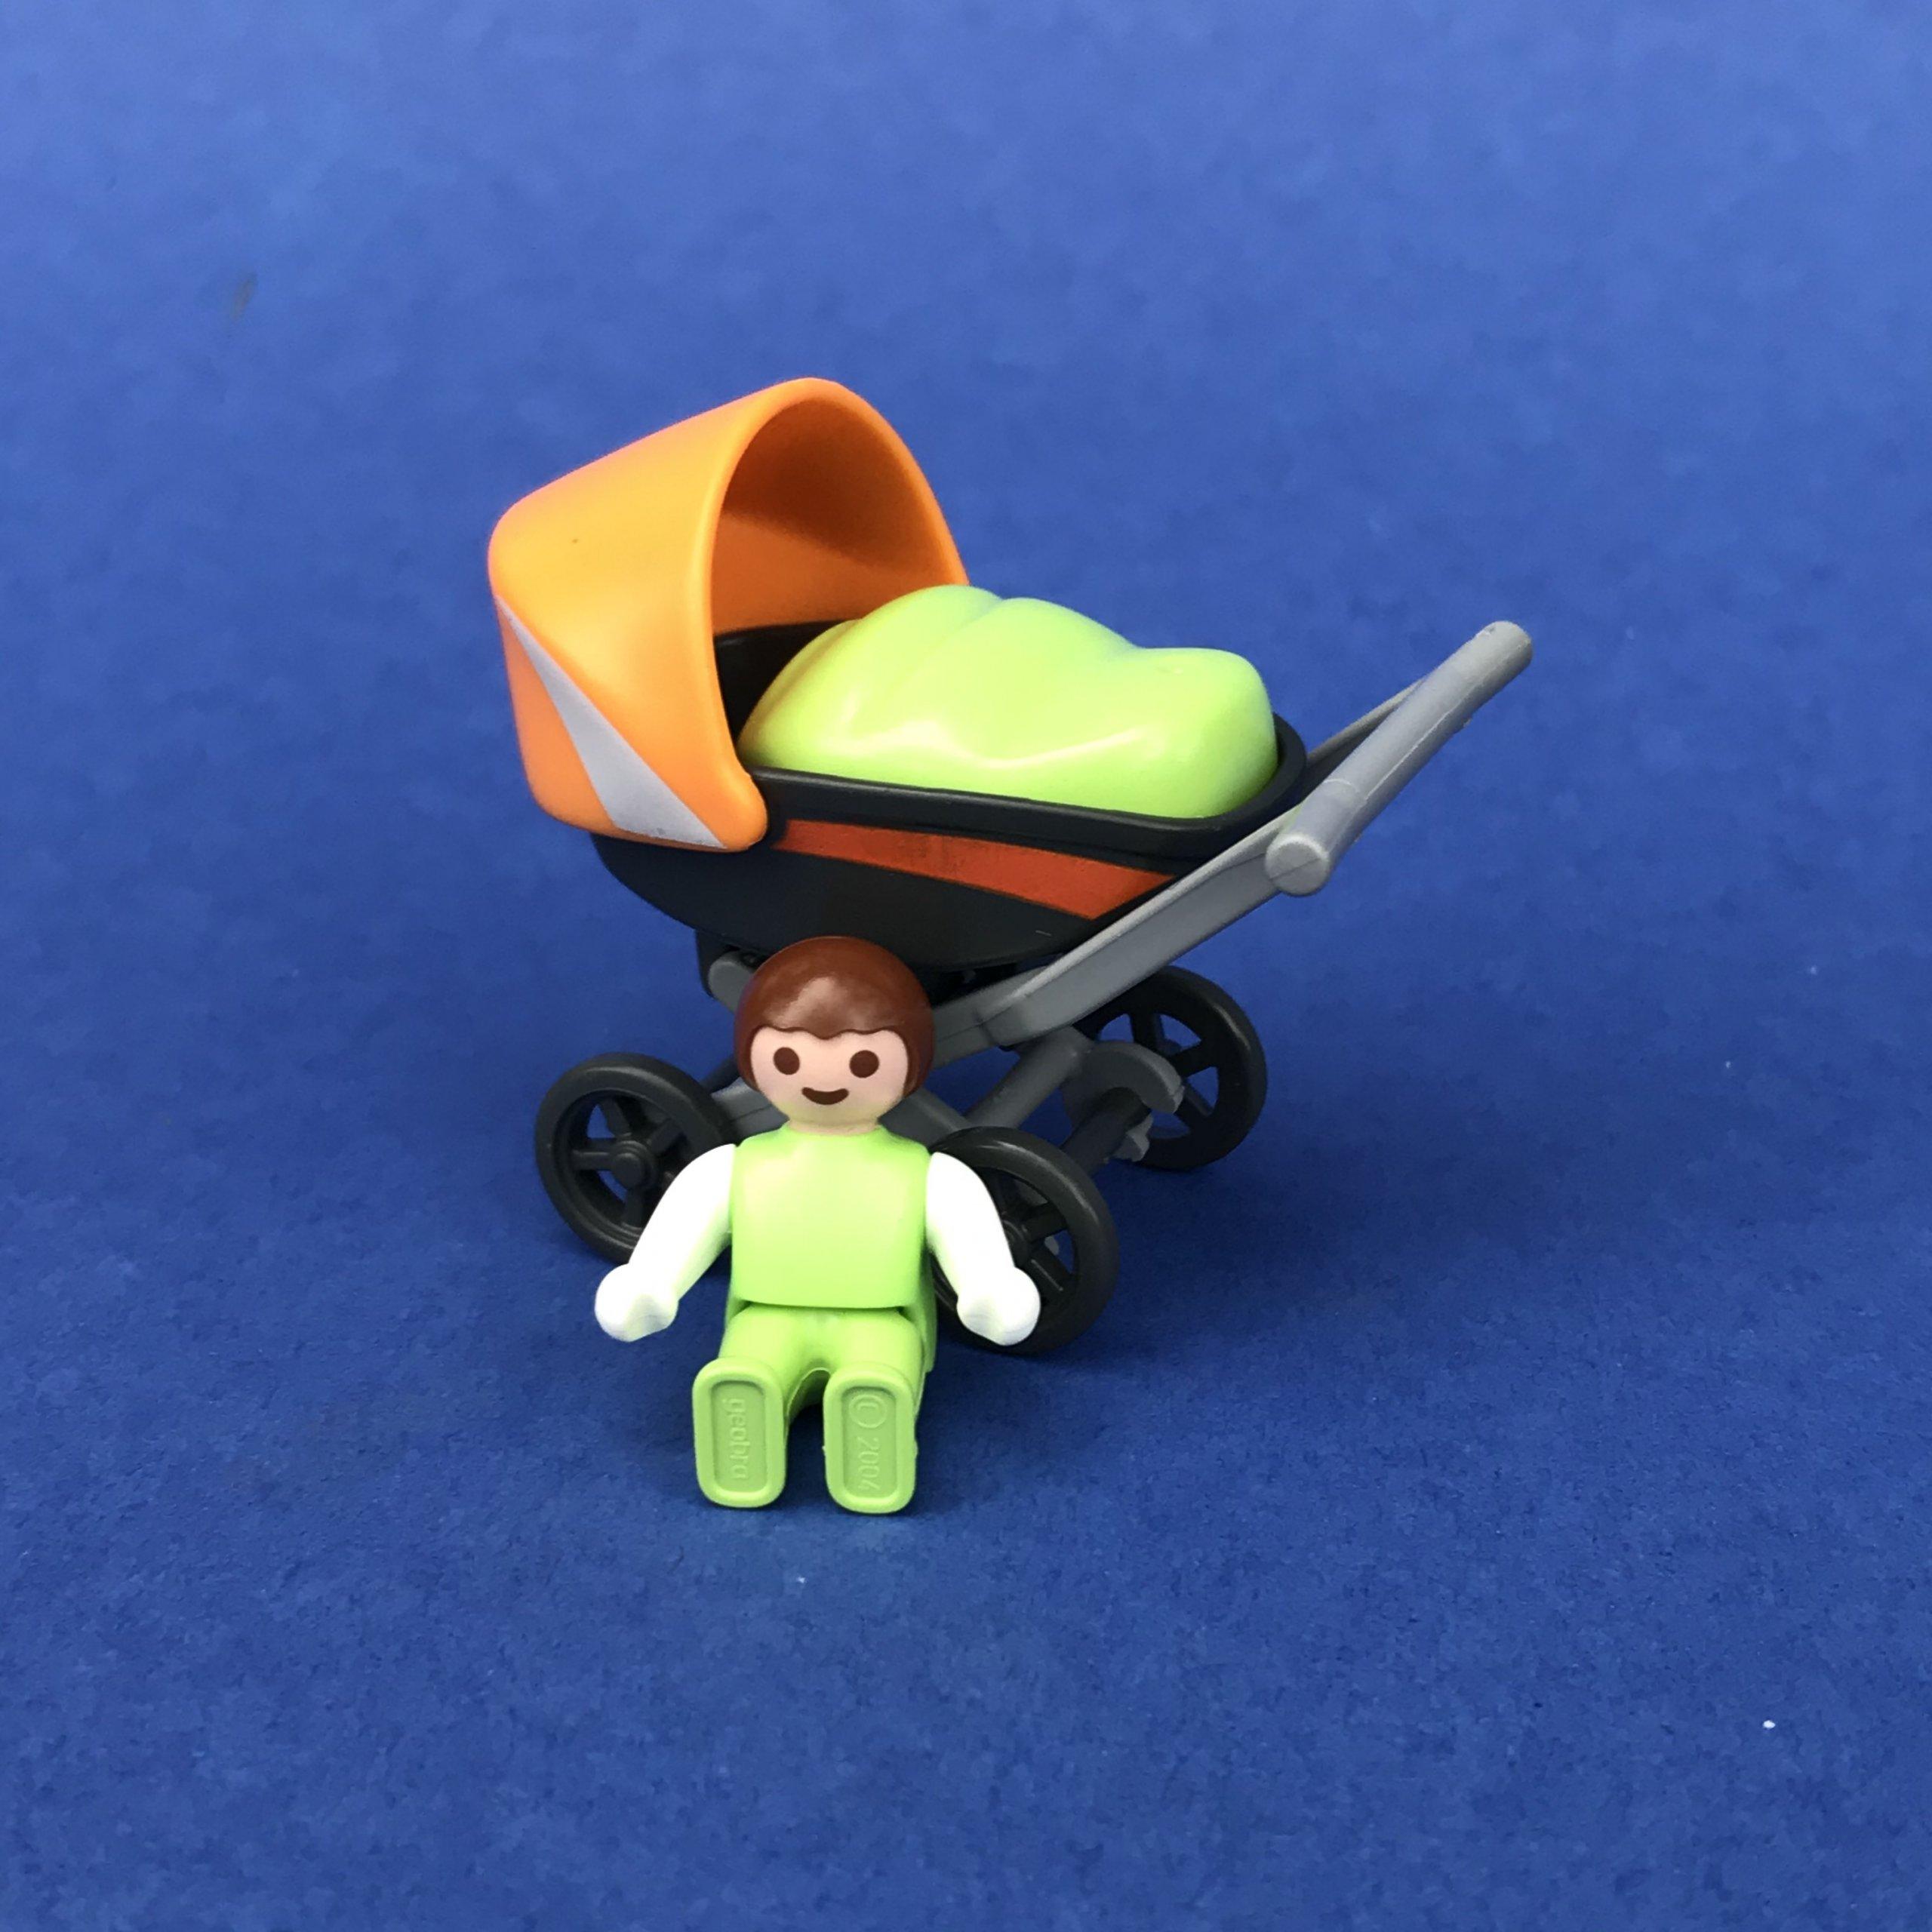 Playmobil-kinderwagen